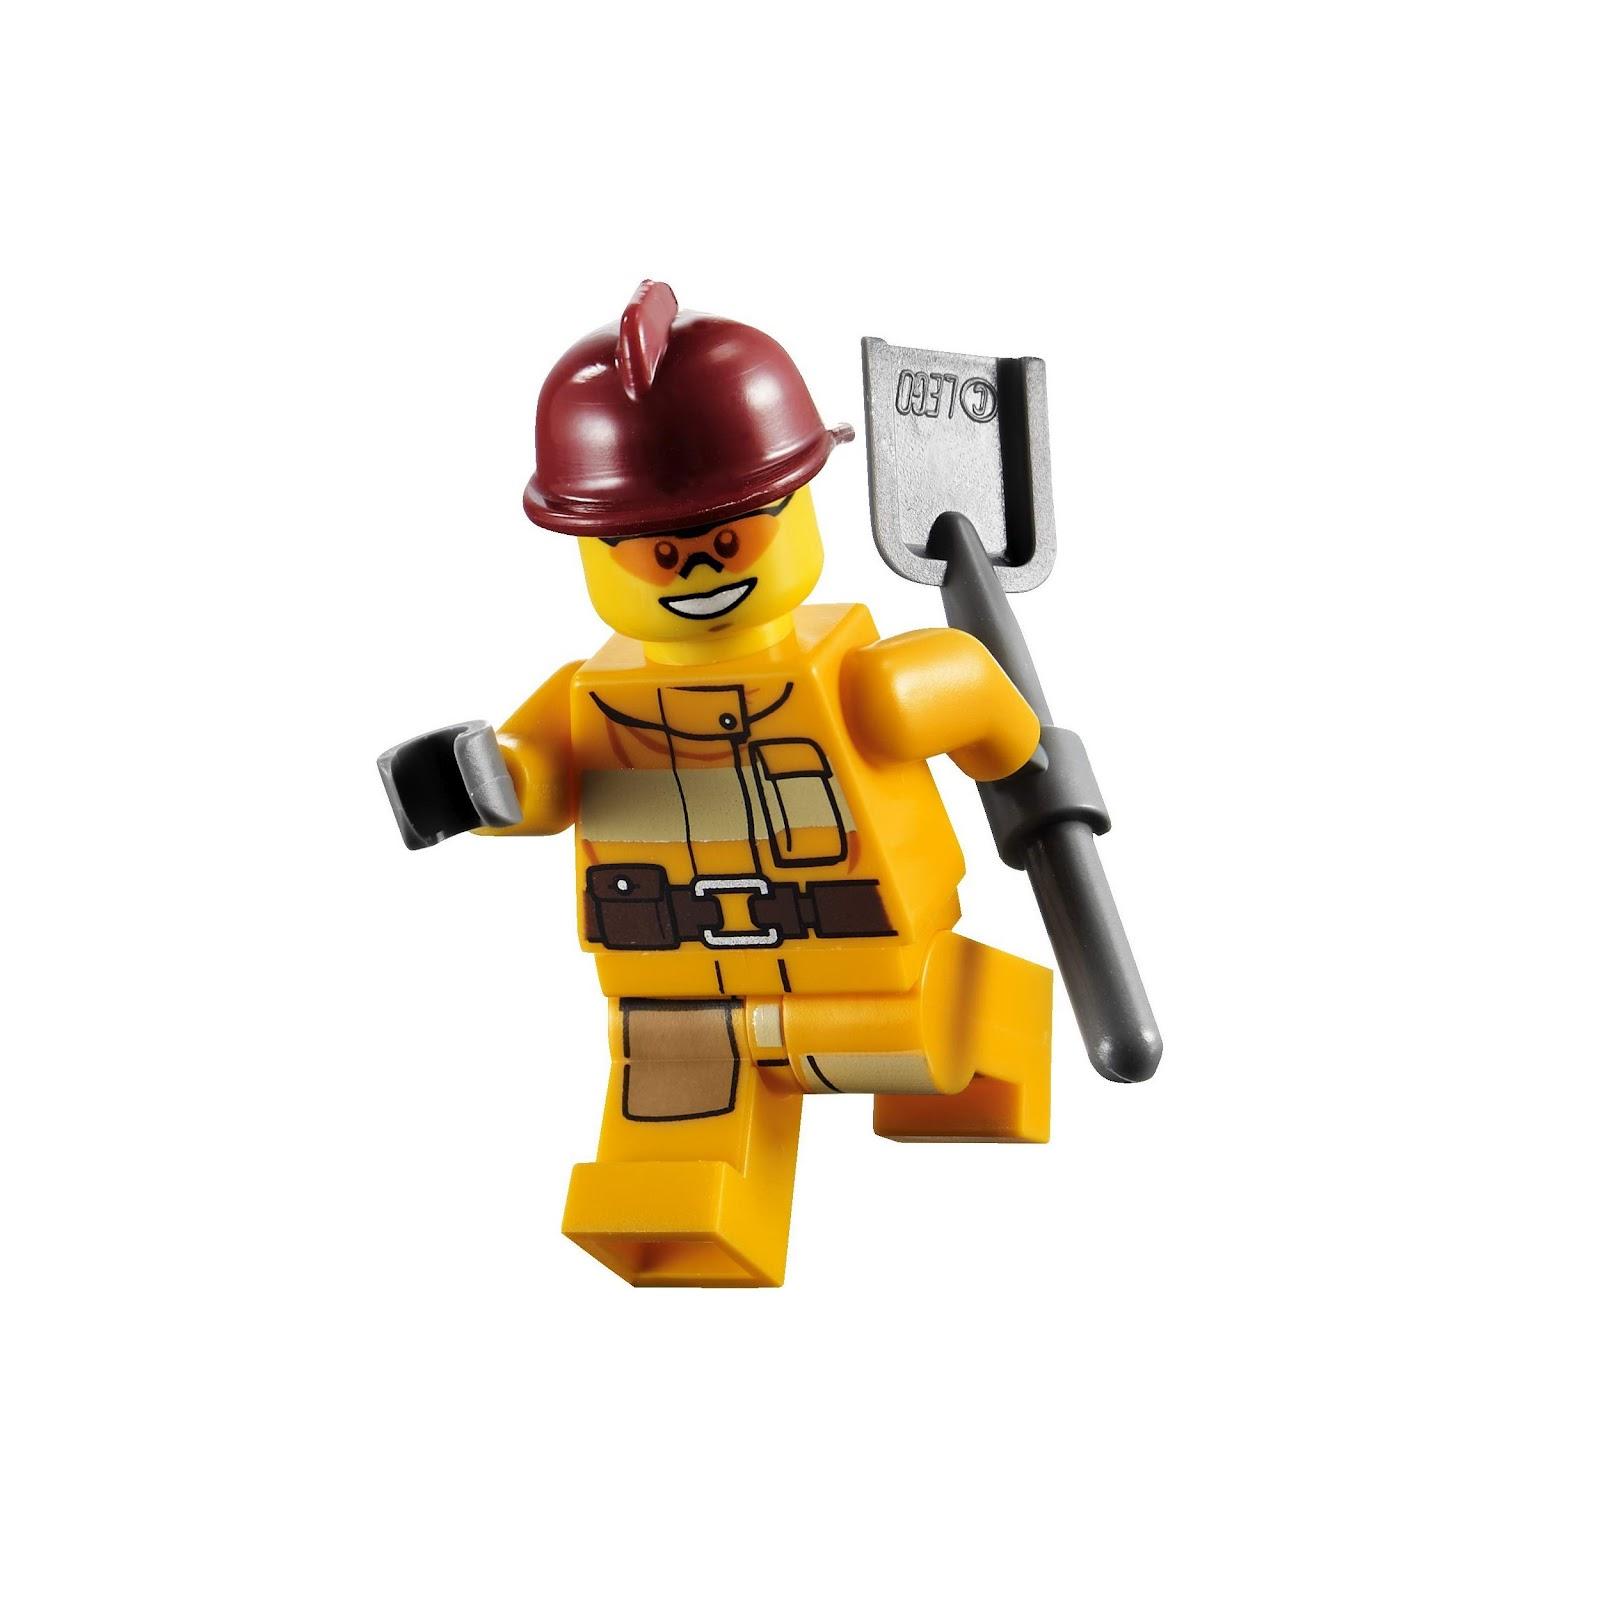 Lego clipart lego city LEGO advent oneTWOBRICK city 4428